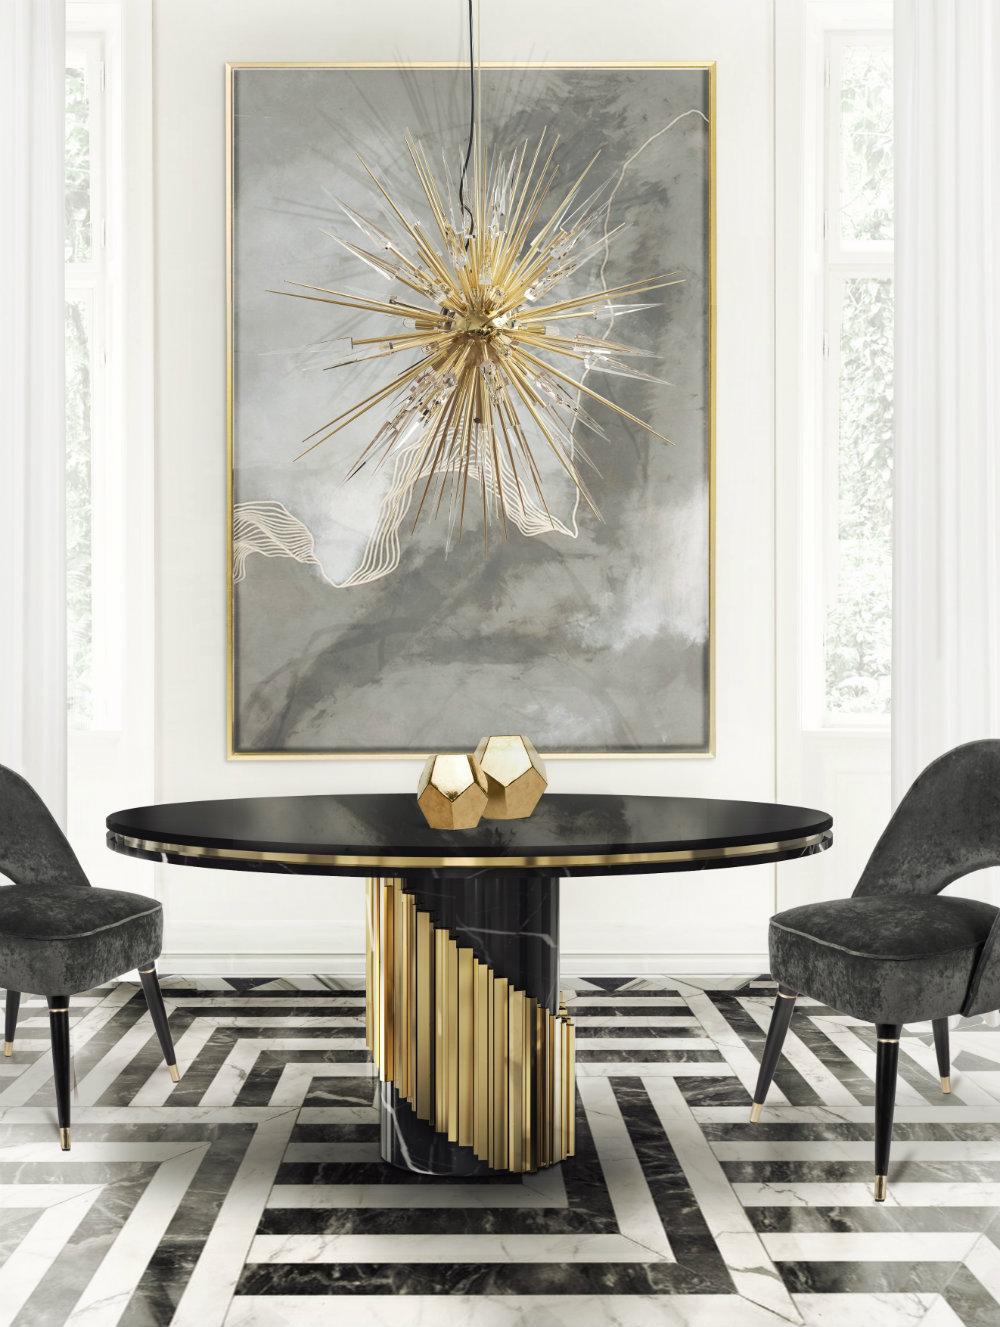 3 Luxury Home Decor Ideas 04 luxury home decor ideas 3 Luxury Home Decor Ideas 3 Luxury Home D  cor Ideas 04